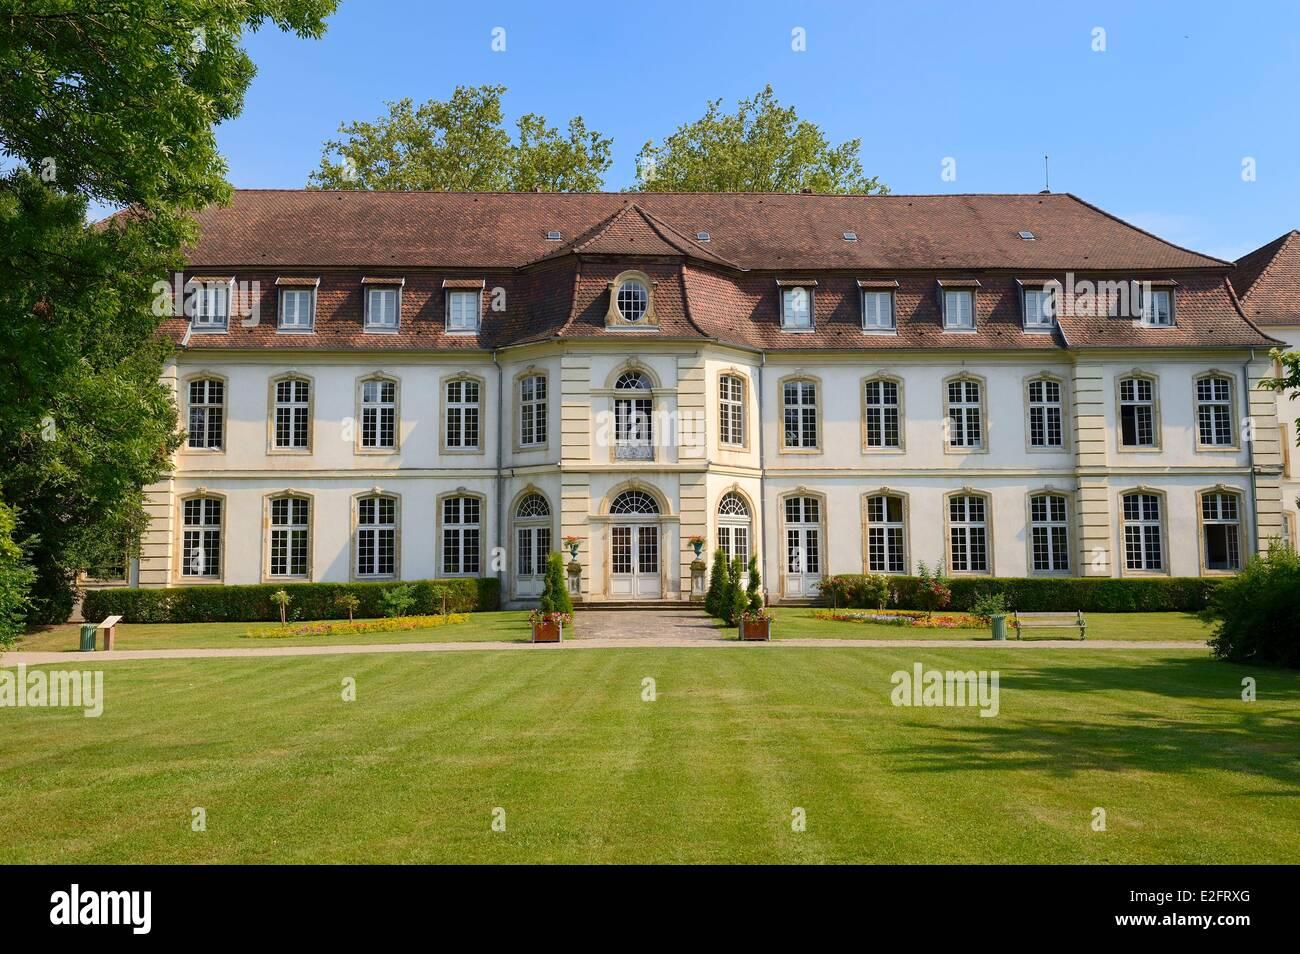 France Haut Rhin Mulhouse Rixheim Musee Du Papier Peint De L Hotel